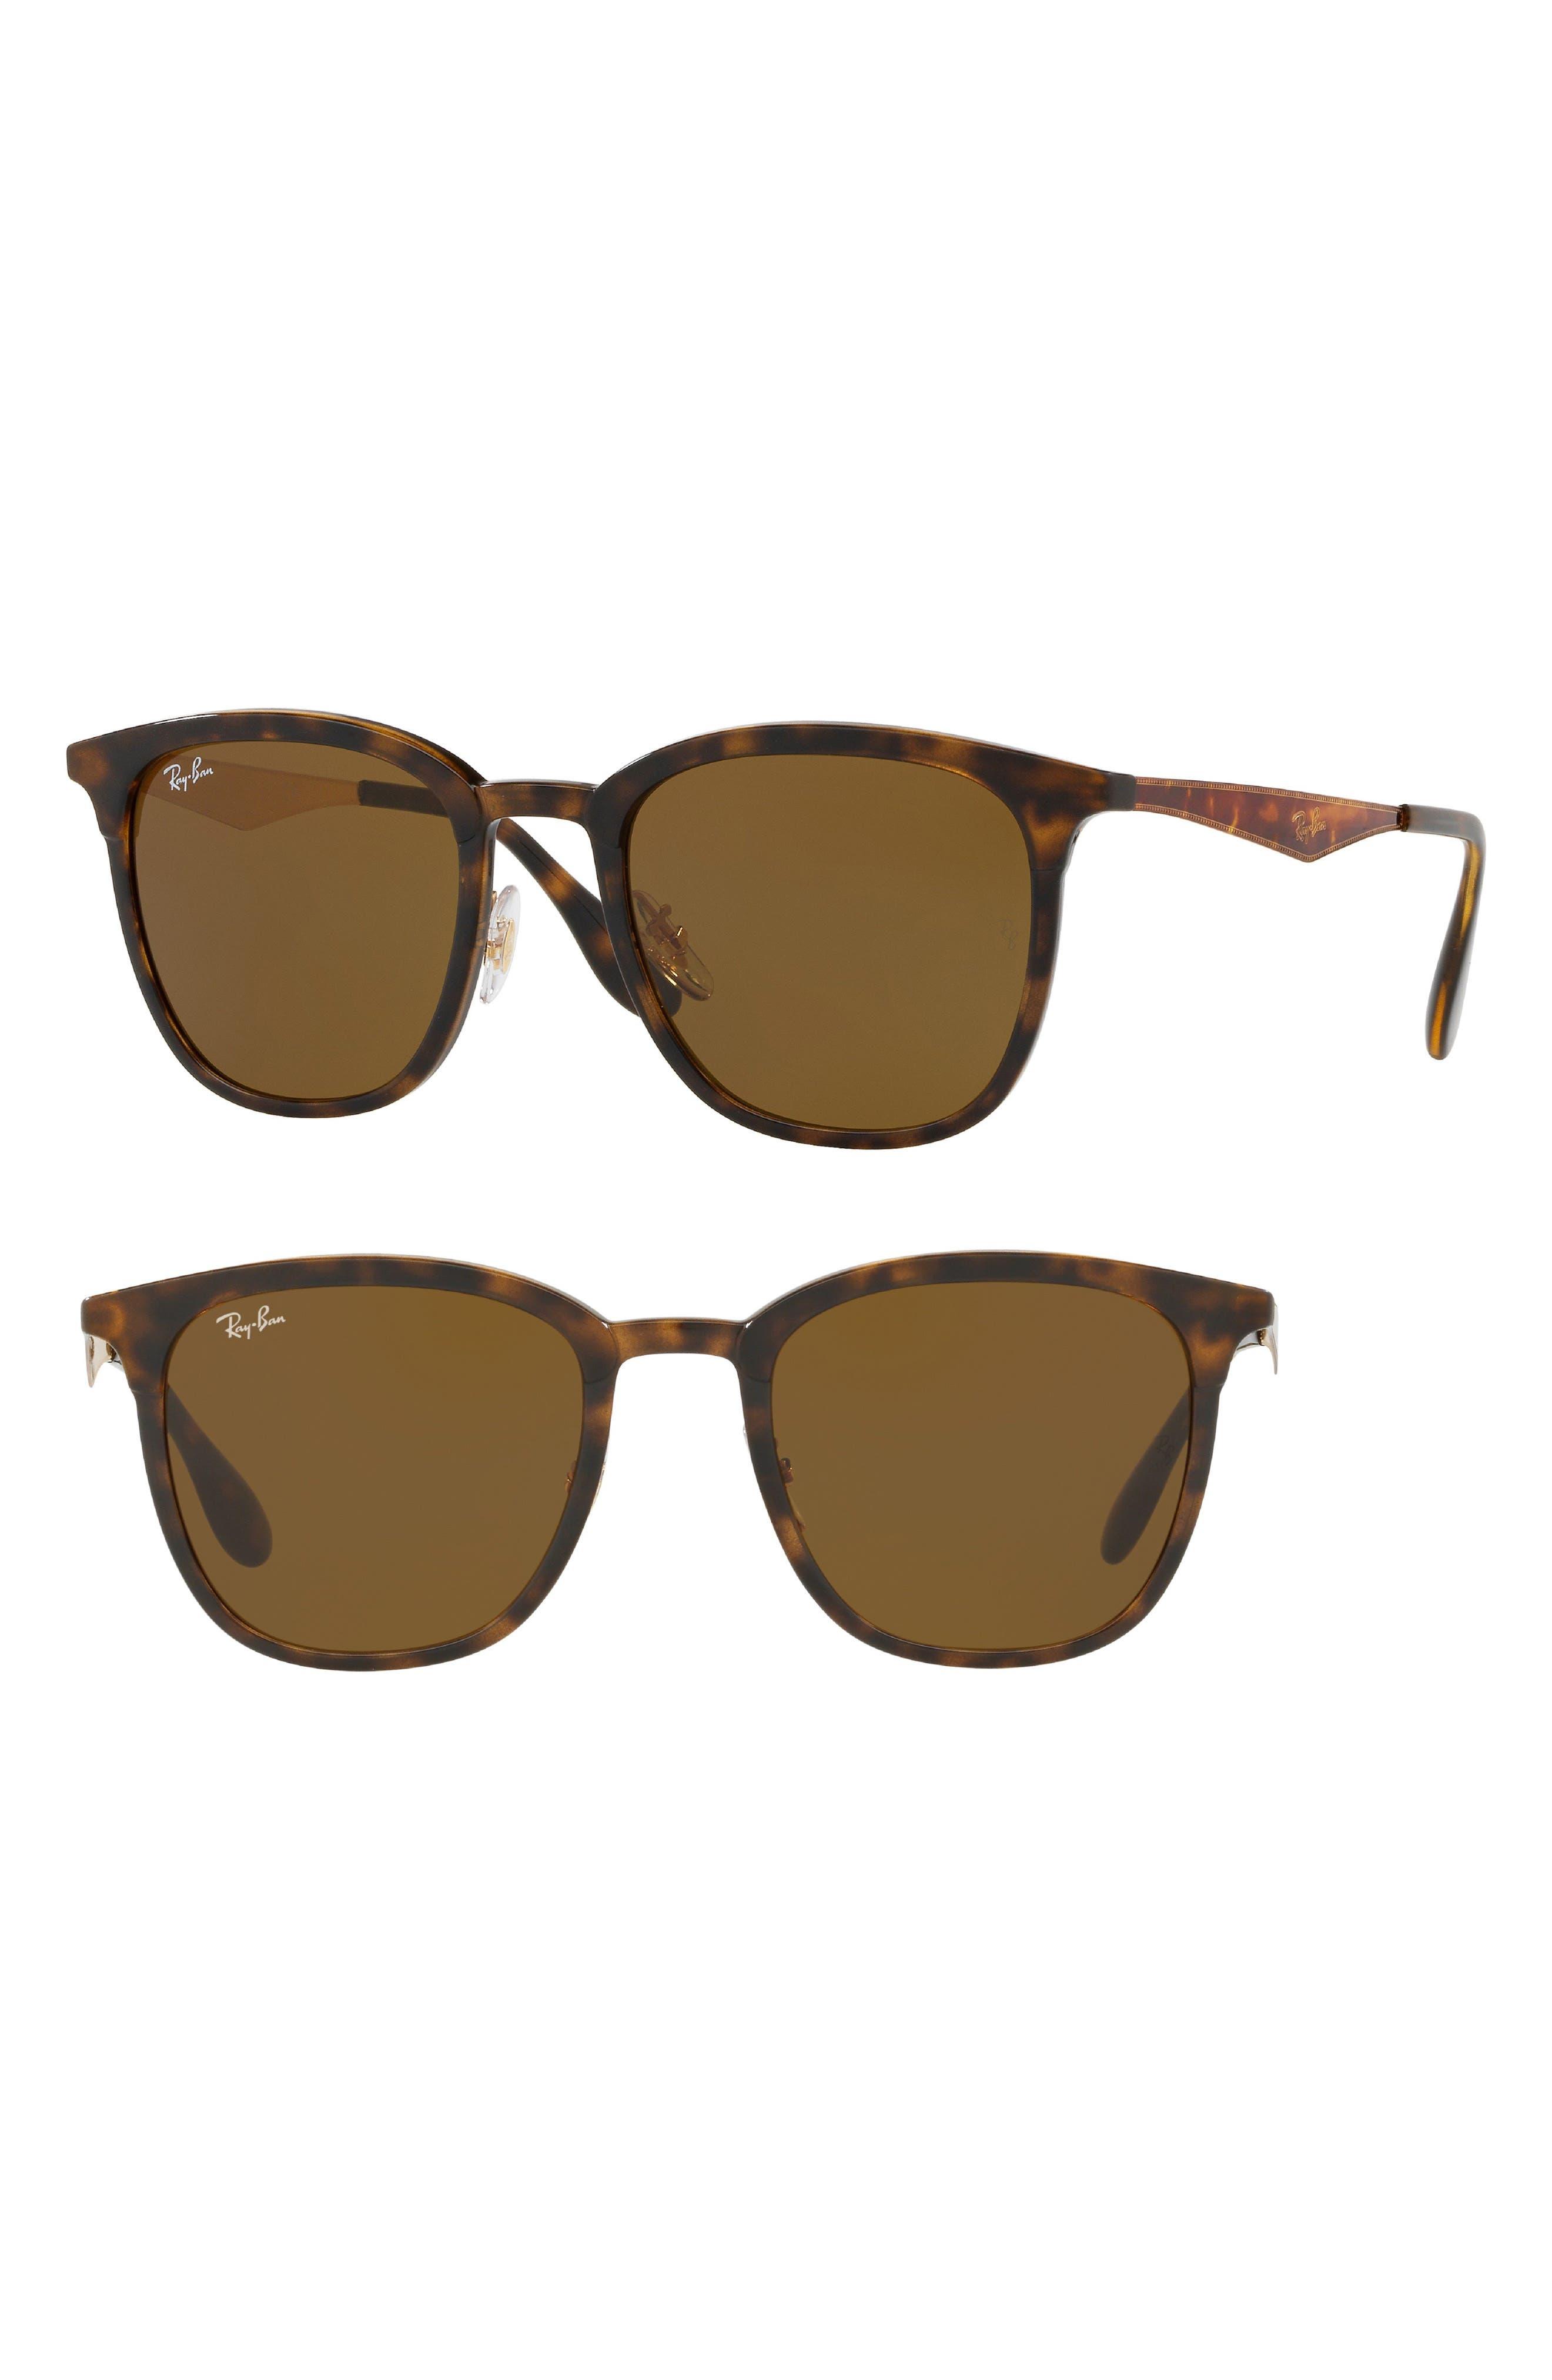 Highstreet 51mm Square Sunglasses,                         Main,                         color, HAVANA